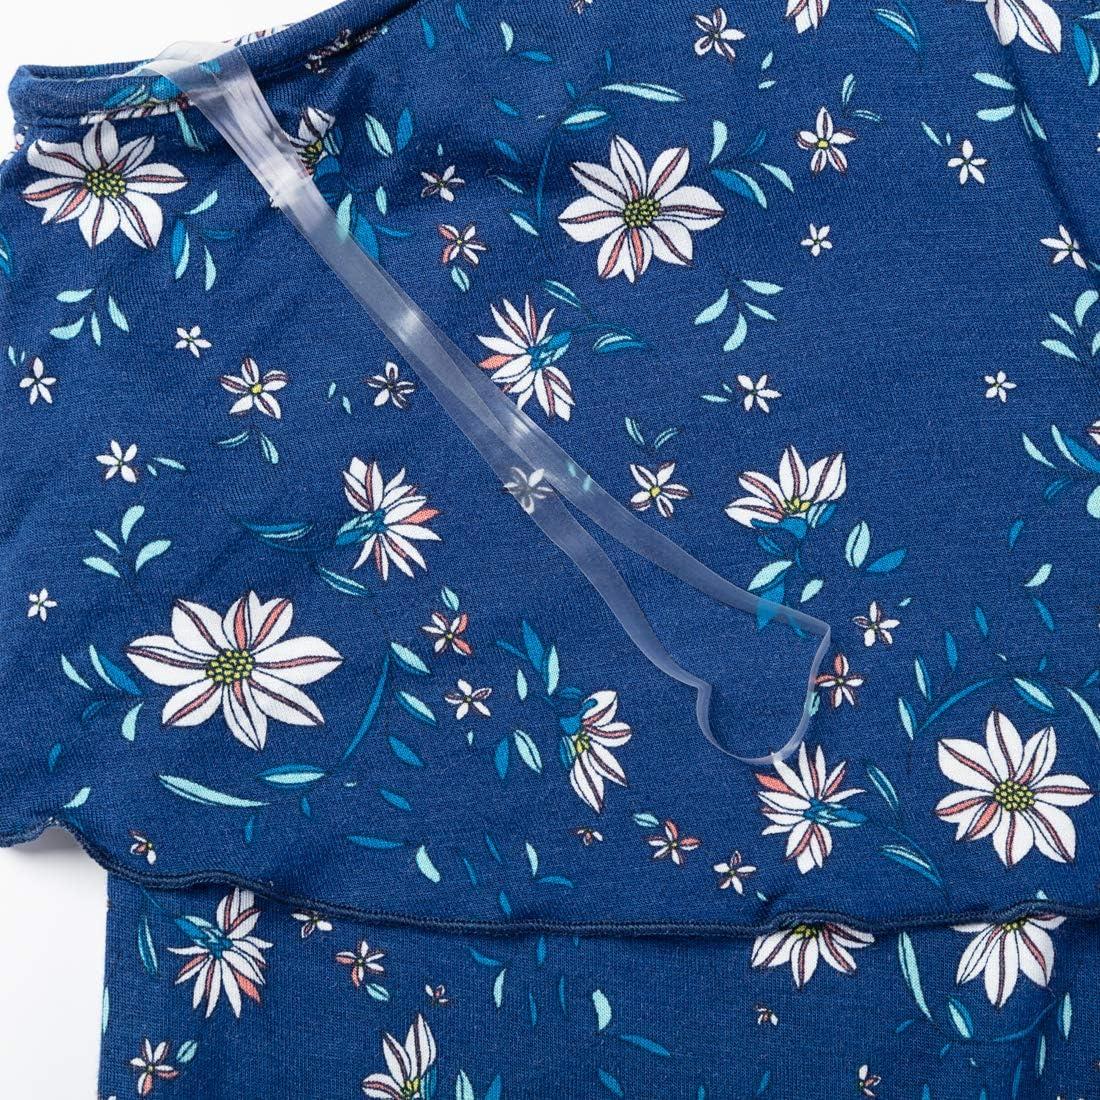 Dolcevida Women/'s V-Neck Floral Print Short Jumpsuit Romper Sleeveless Spaghetti Strap /& Short Sleeve Playsuit